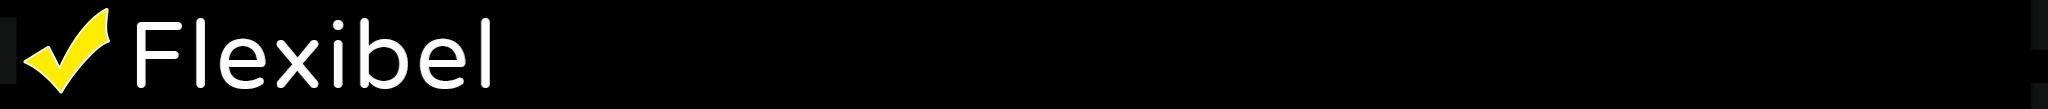 K1600_flexibel